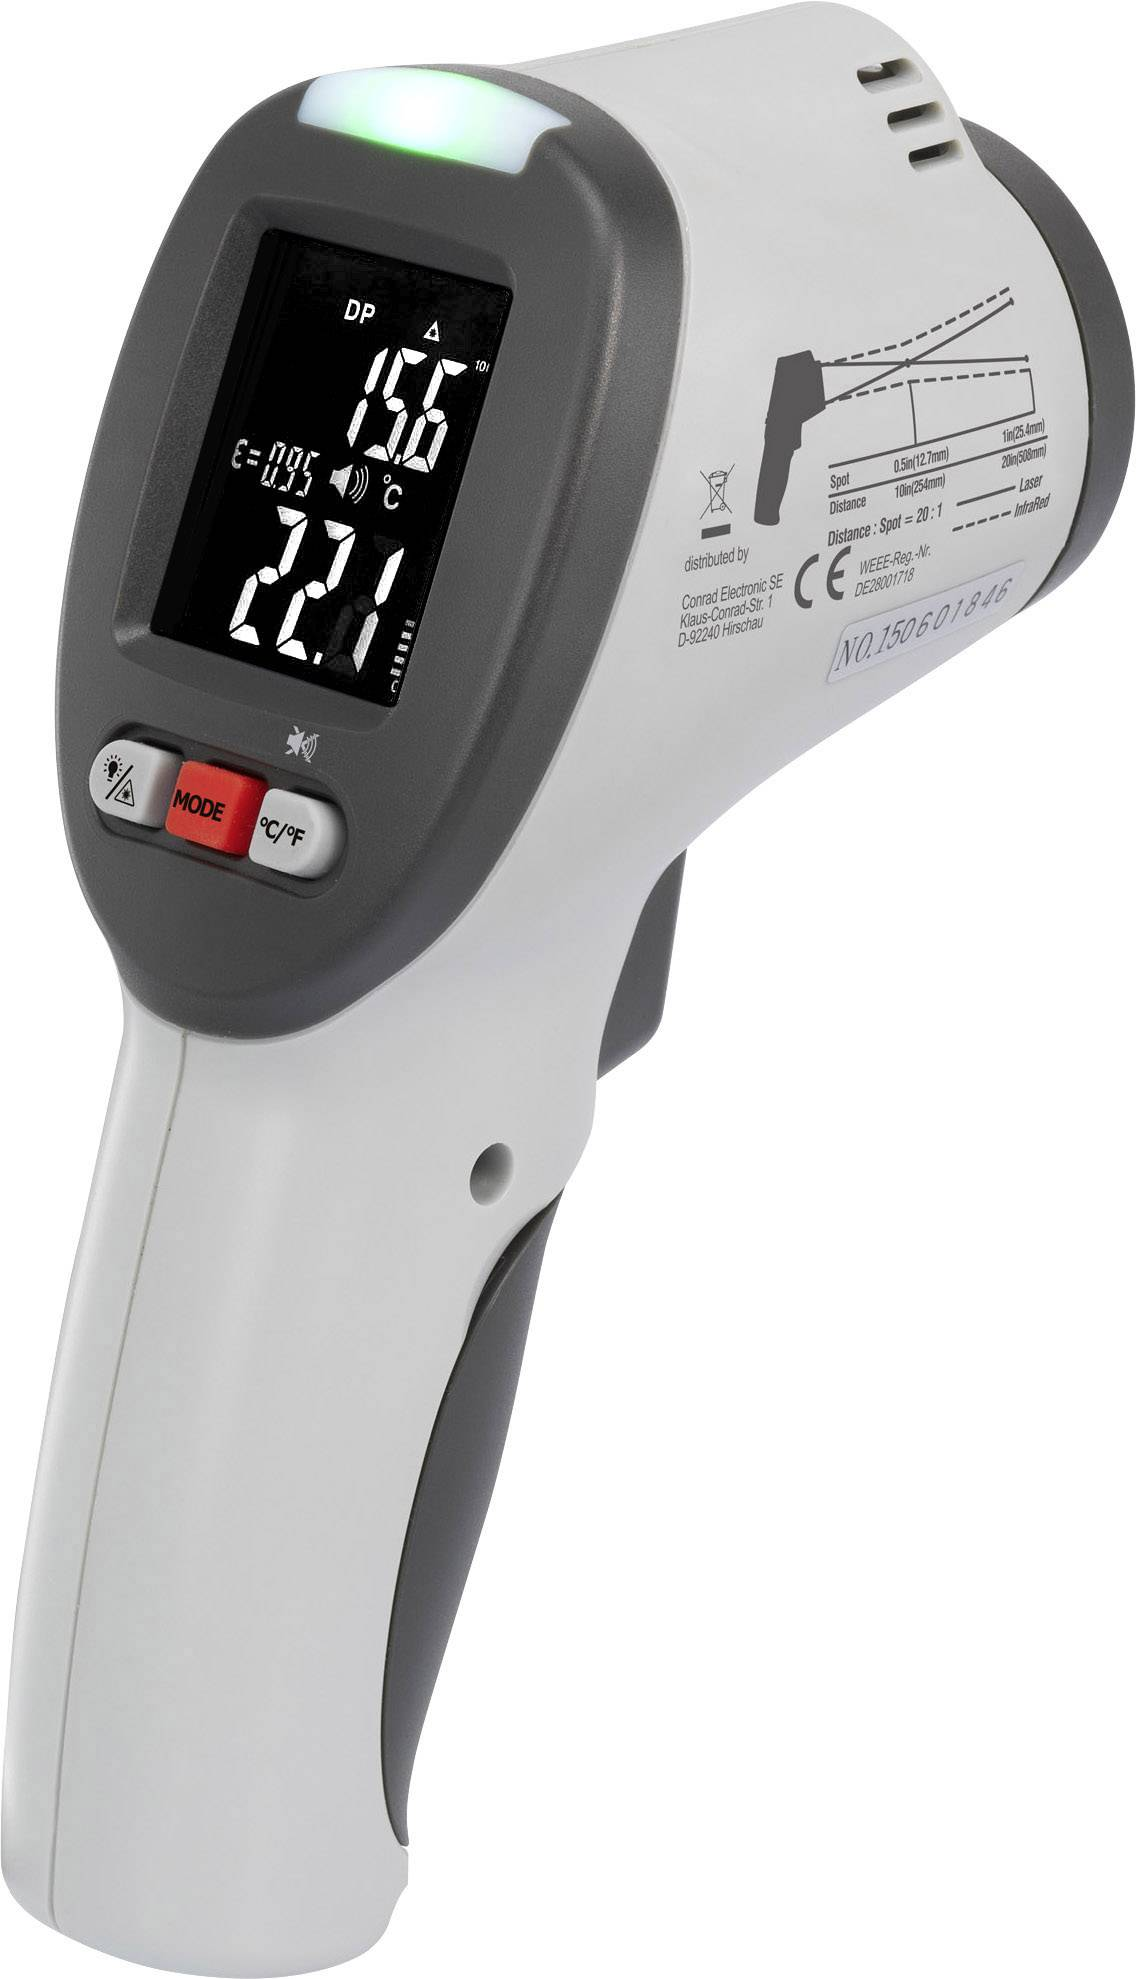 Infračervený teplomer VOLTCRAFT IR-SCAN-350RH/2, Optika 20:1, -50 do +380 °C